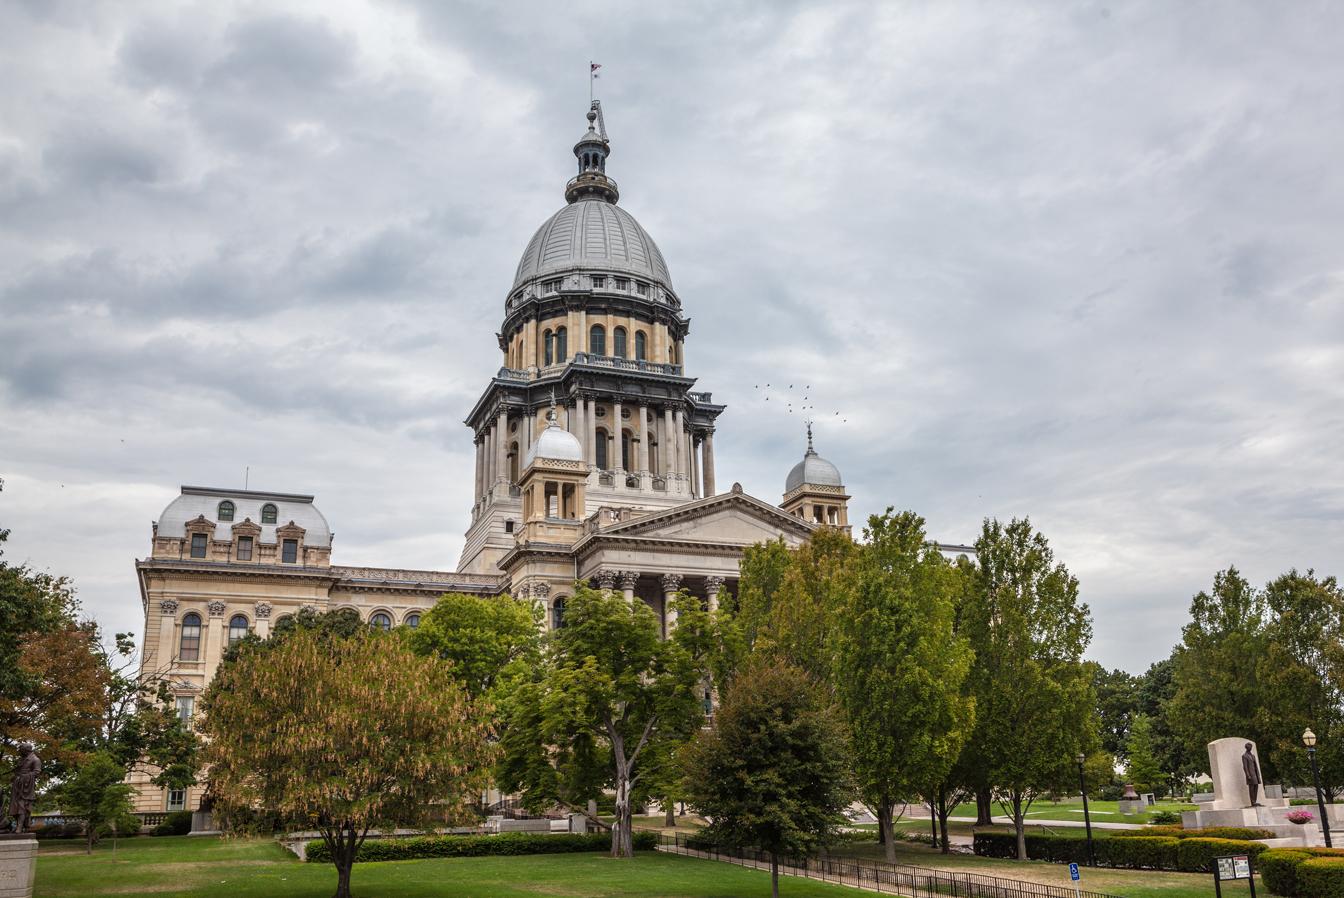 Illinois Supreme Court allows limited scope legal representations